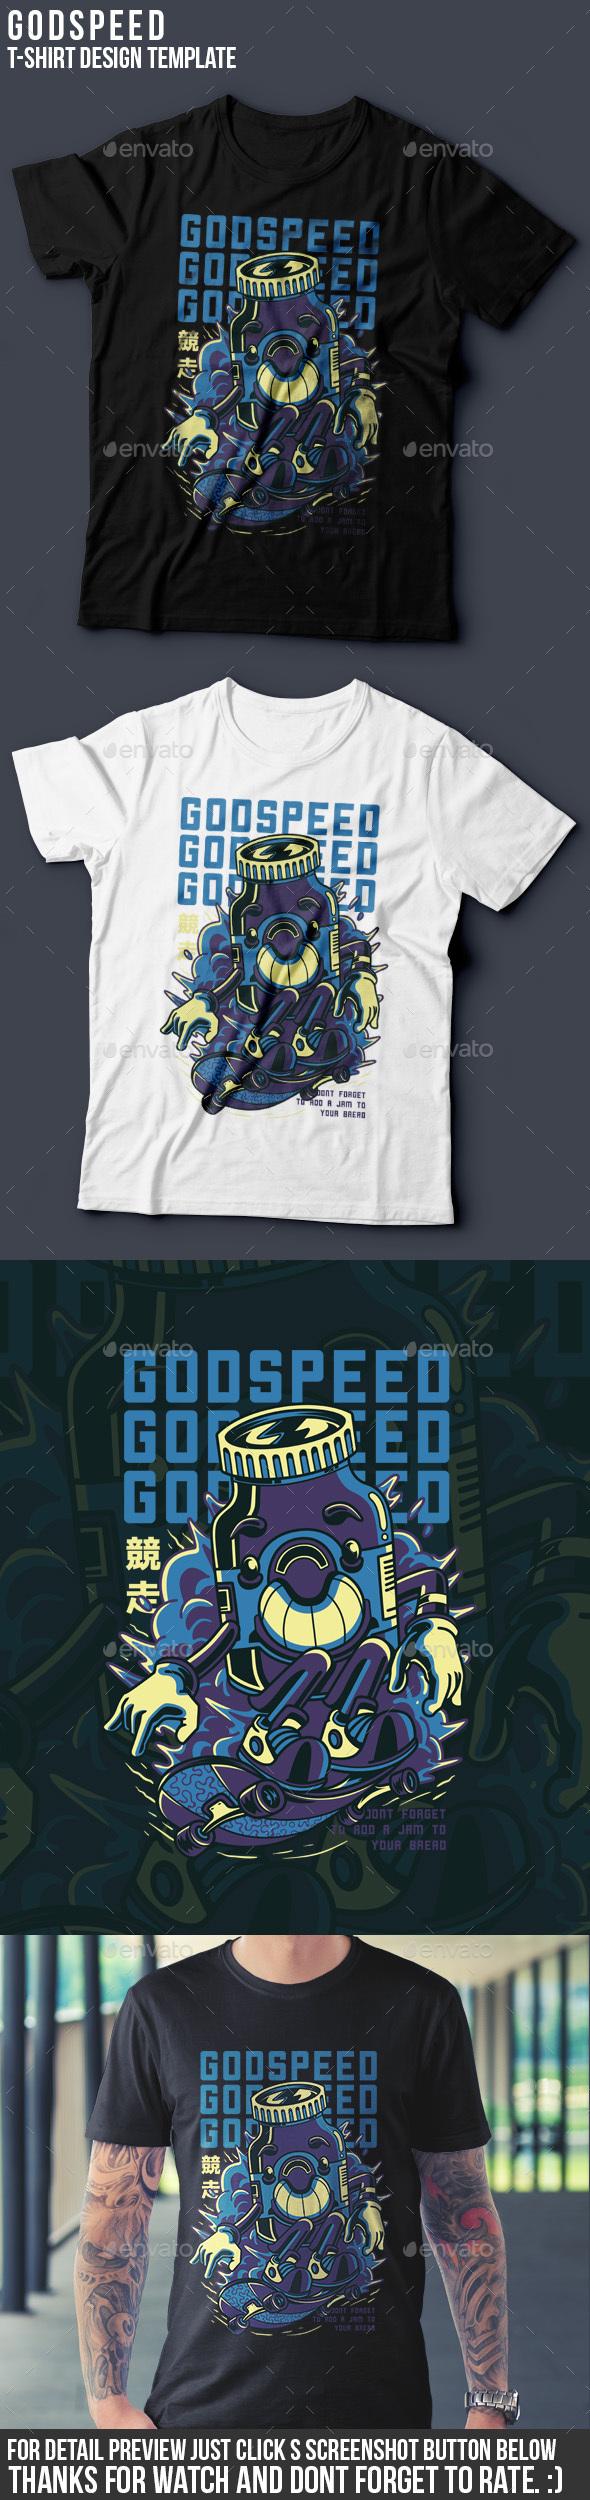 Godspeed T-Shirt Design - Academic T-Shirts